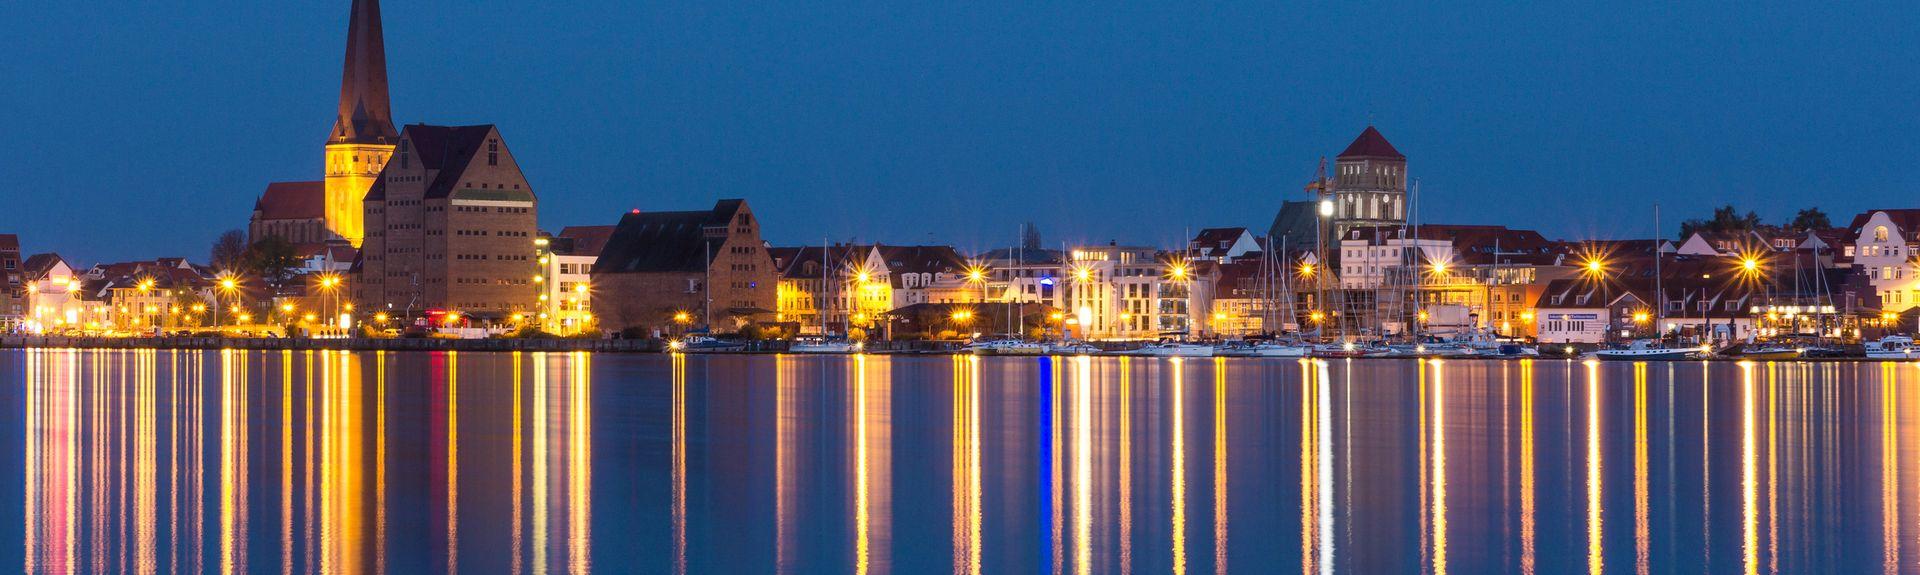 Rostock, Mecklenburg – Δυτική Πομερανία, Γερμανία